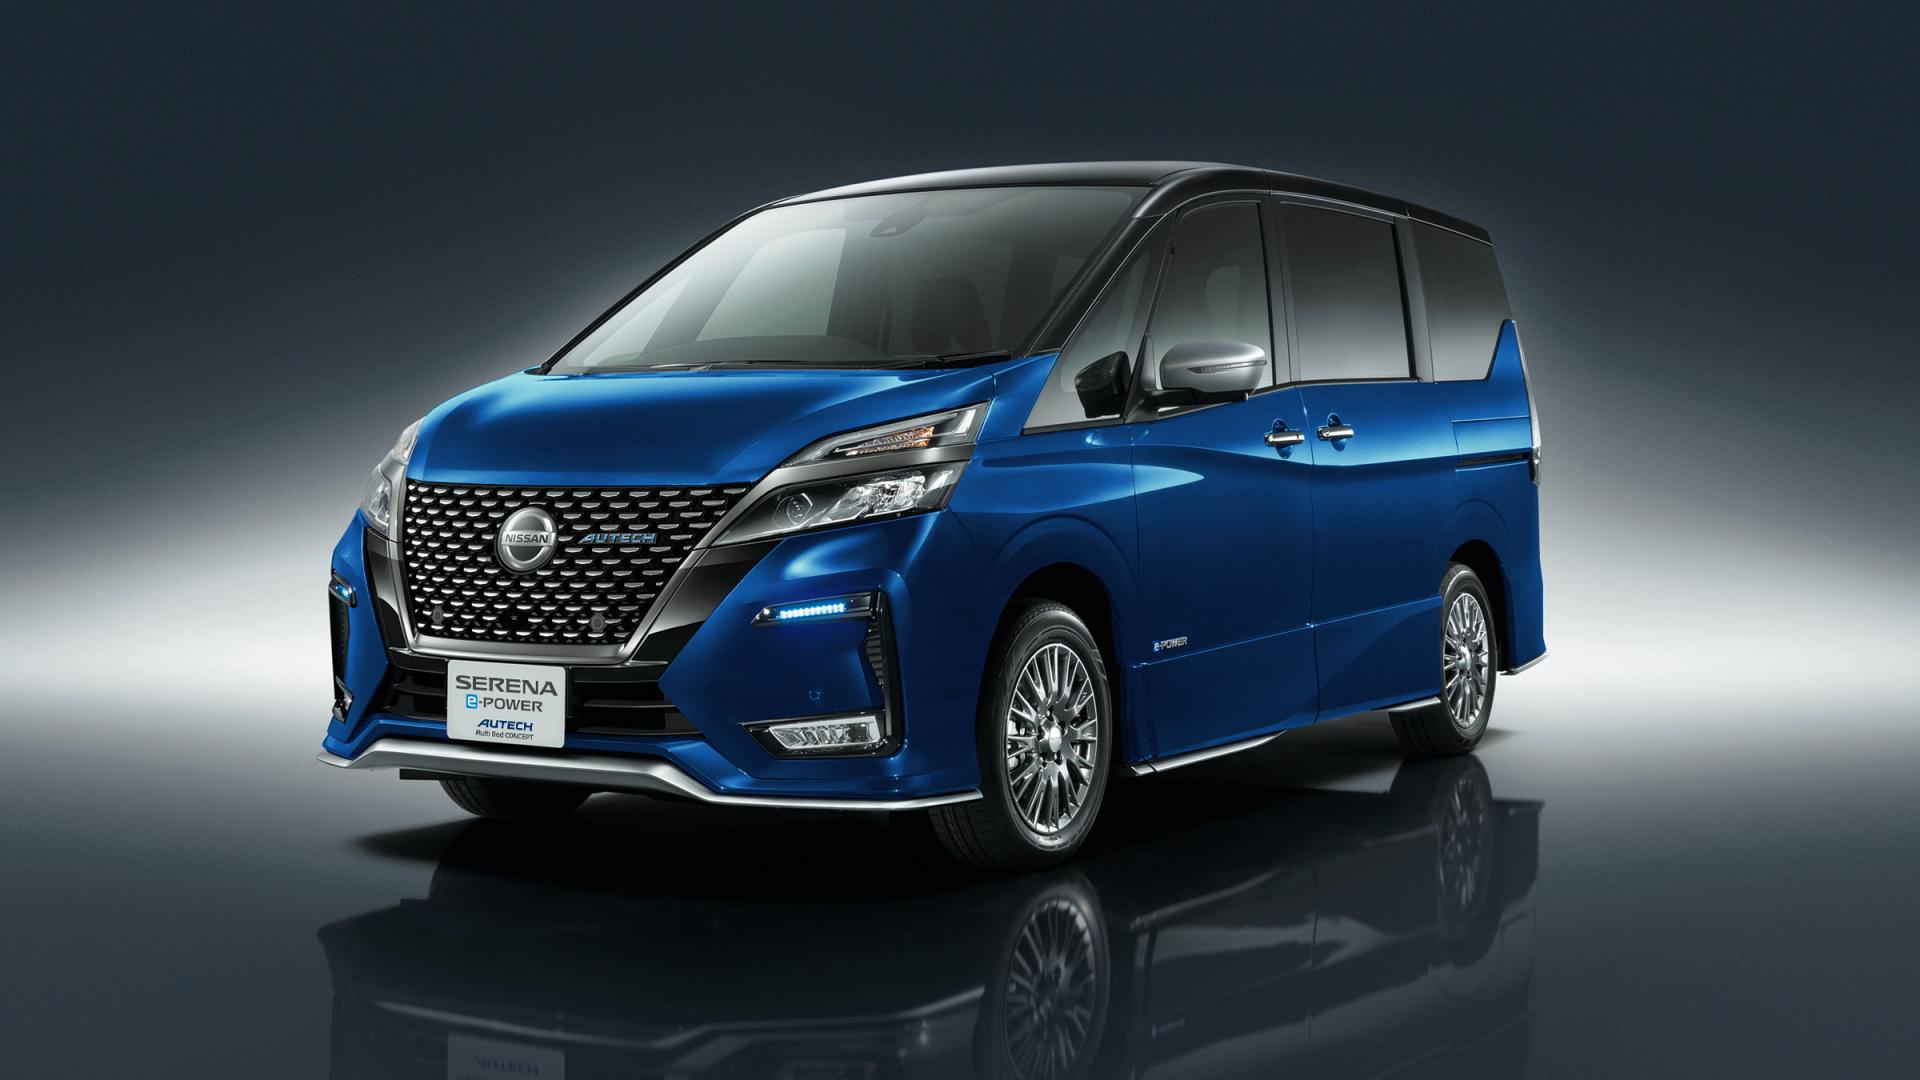 Nissan-Serena-e-Power-Autech-Multi-Bed-Concept